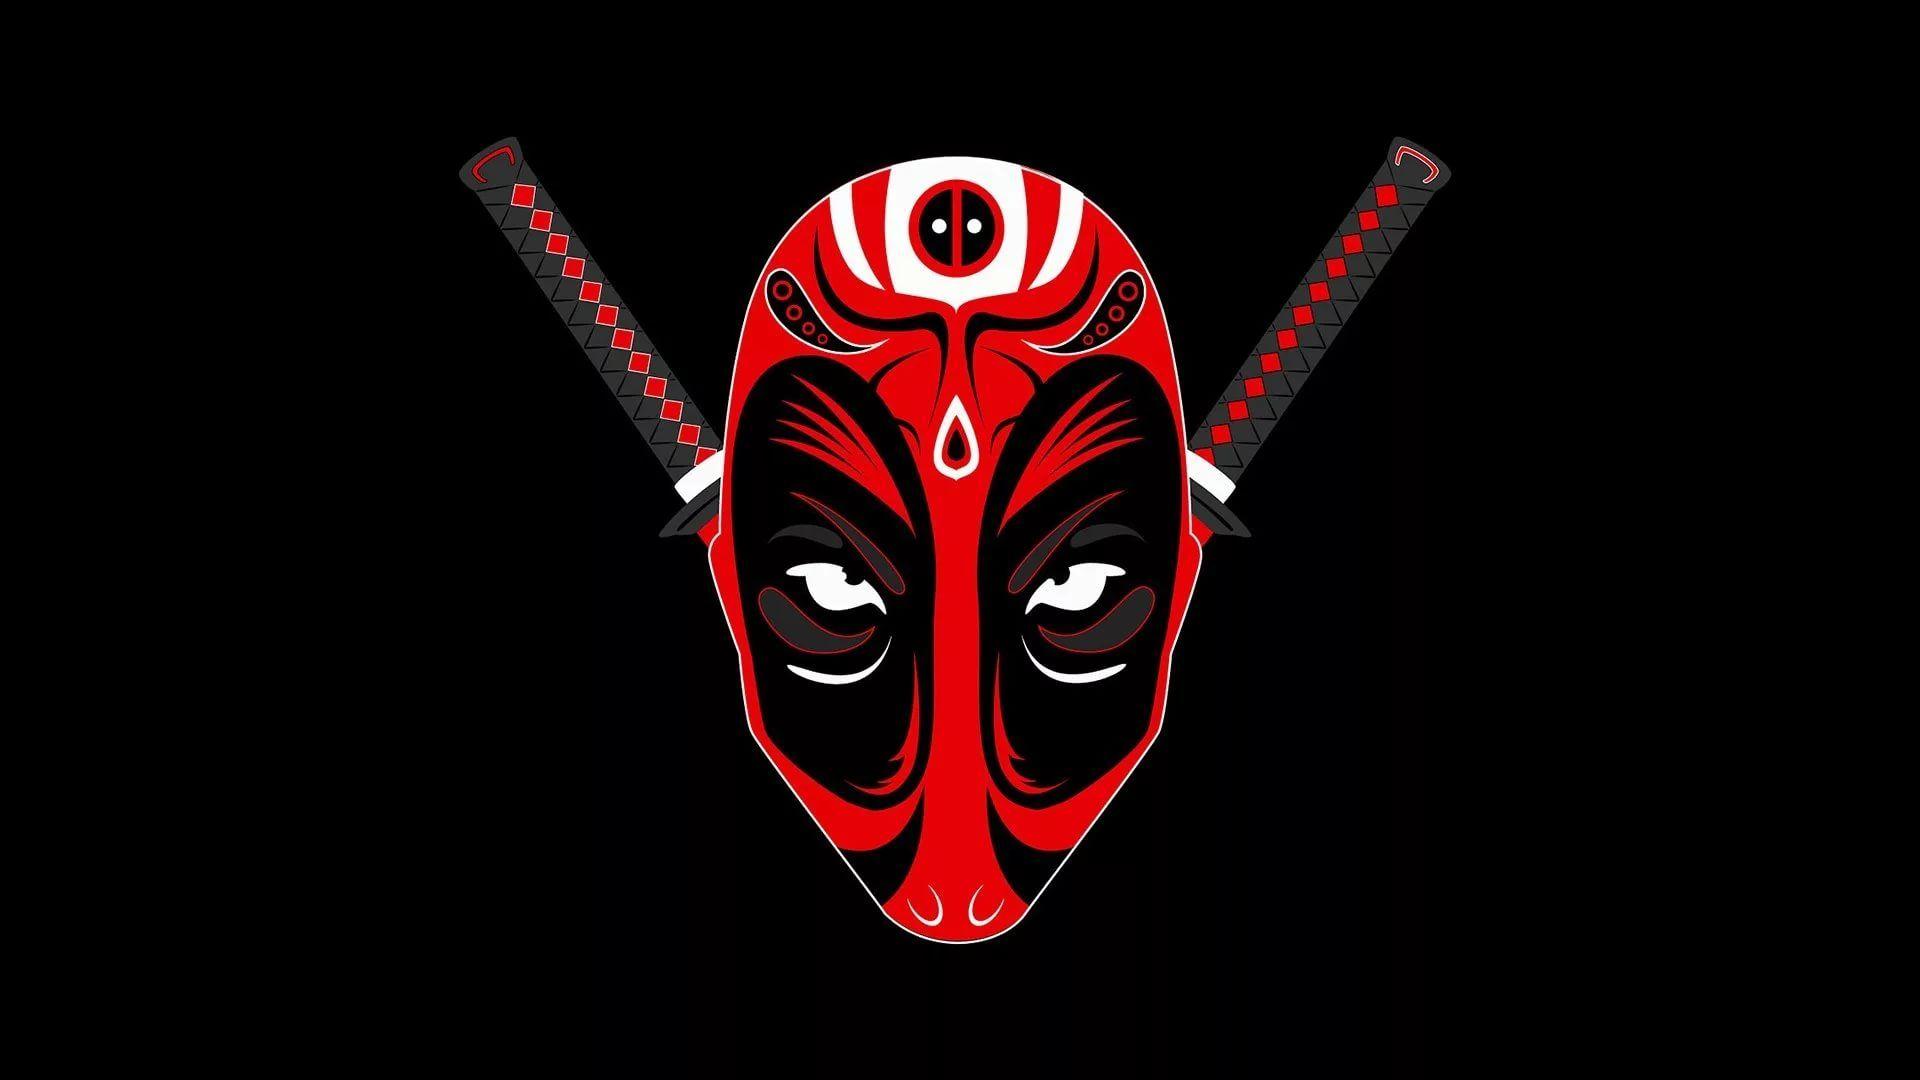 Cool Deadpool full hd wallpaper